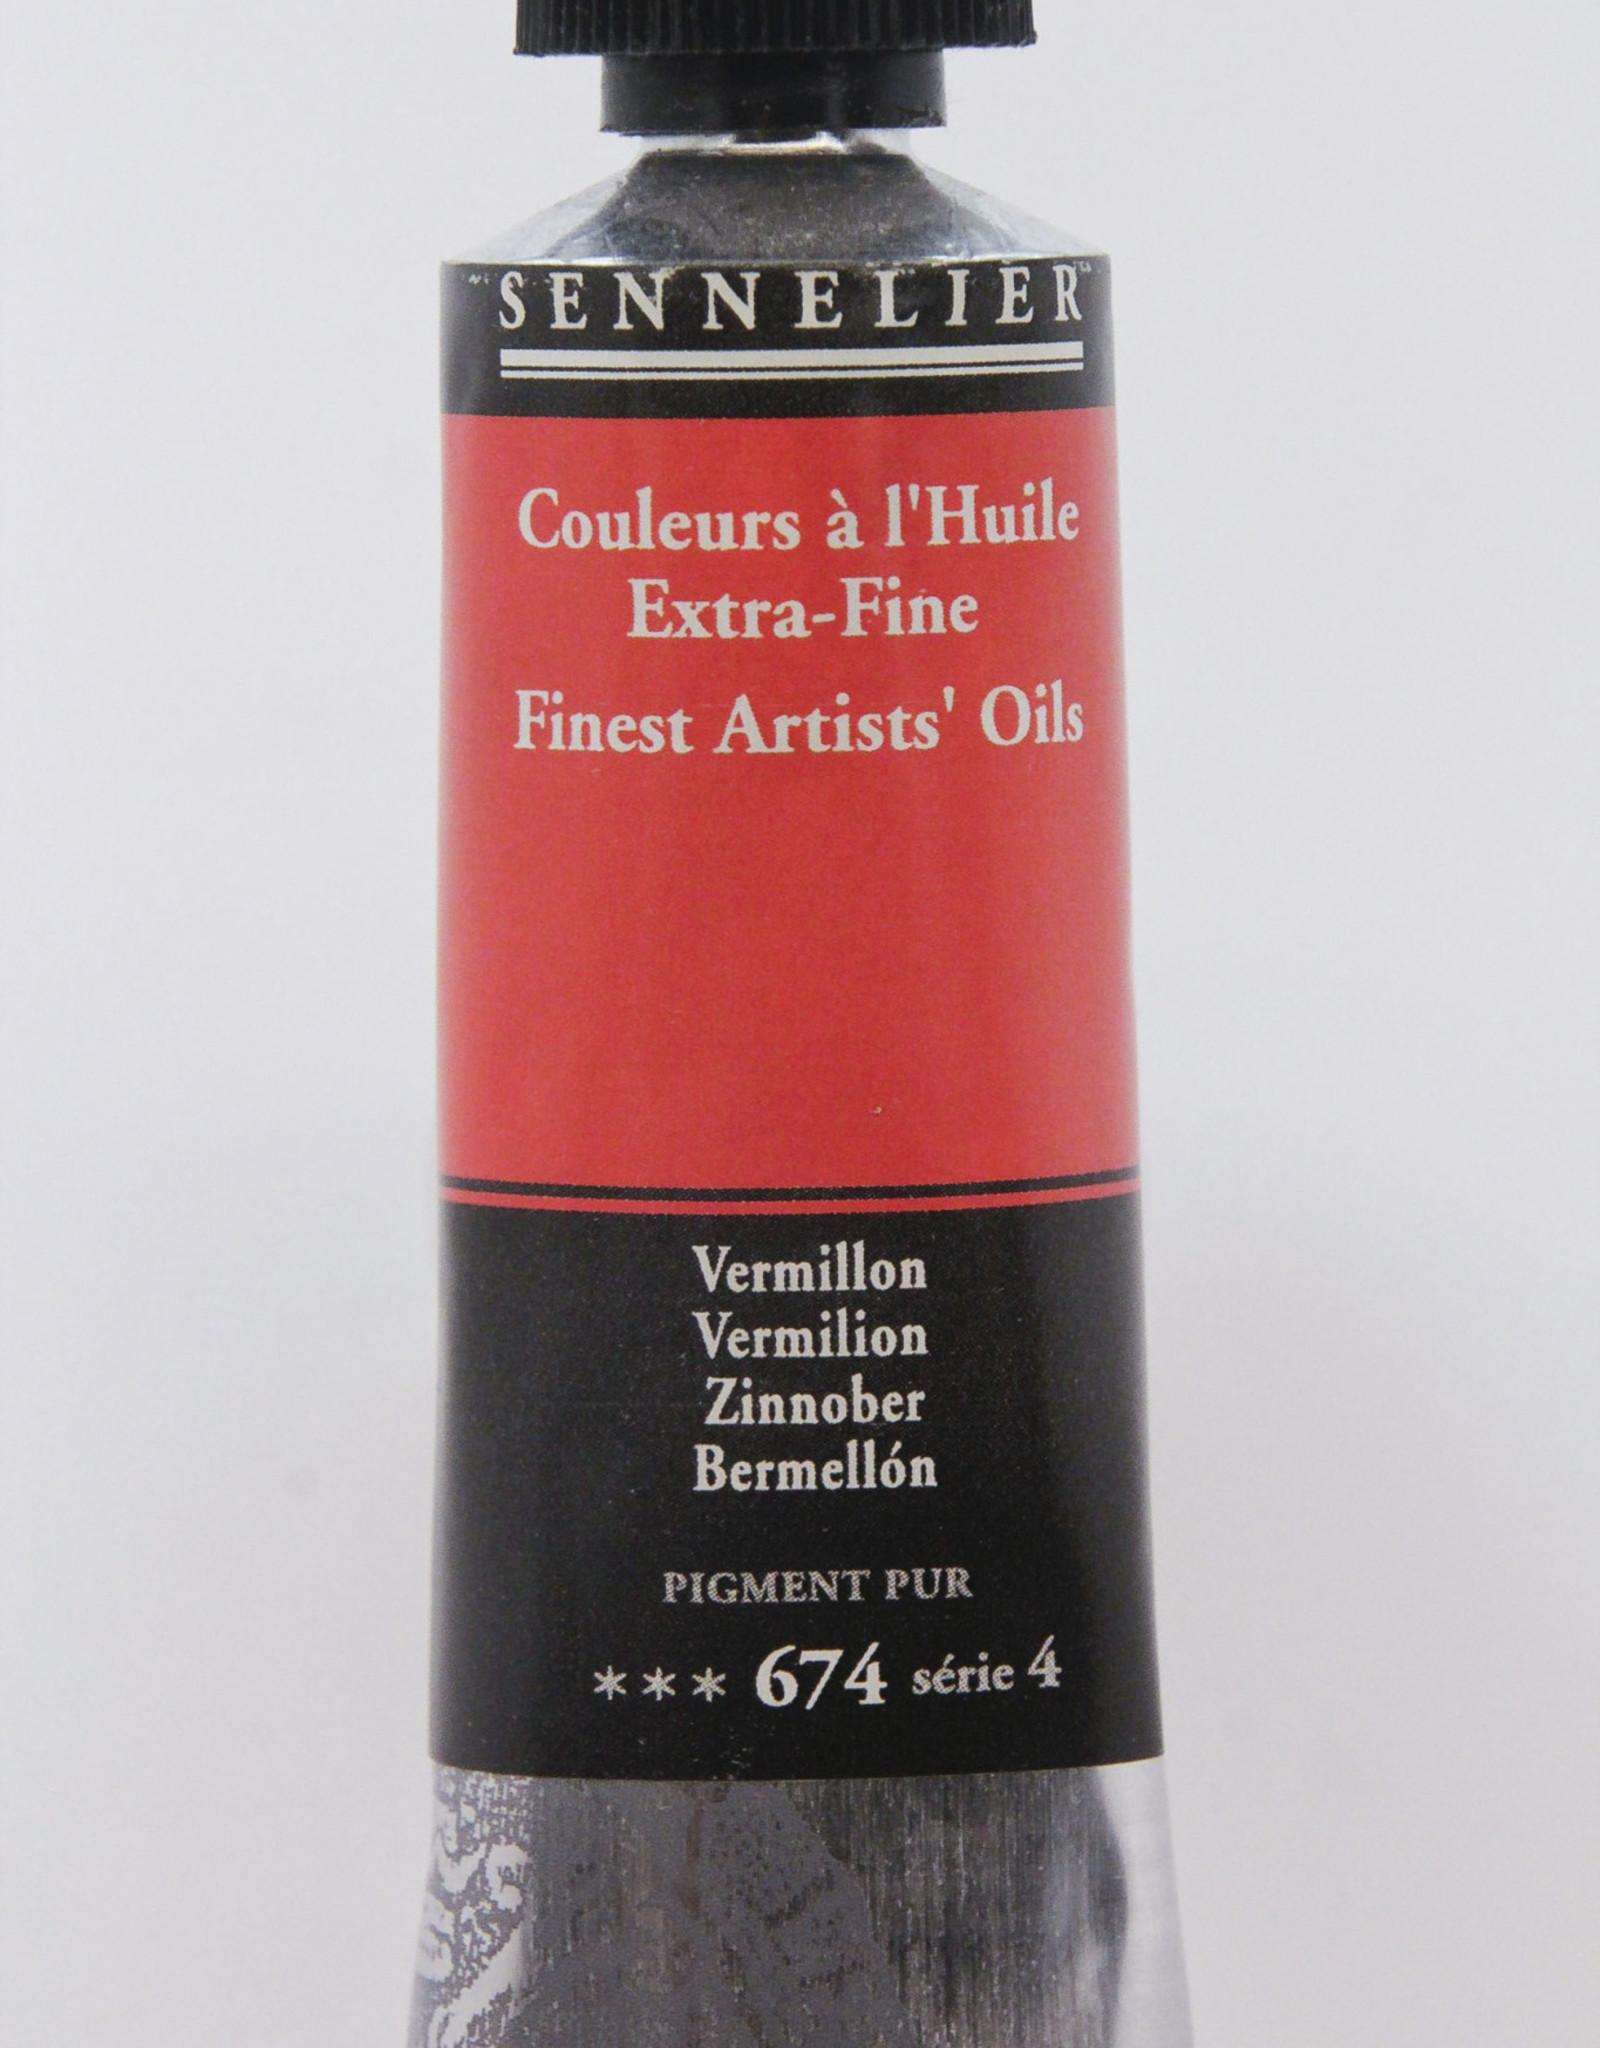 Sennelier, Fine Artists' Oil Paint, Vermillion, 674, 40ml Tube, Series 4